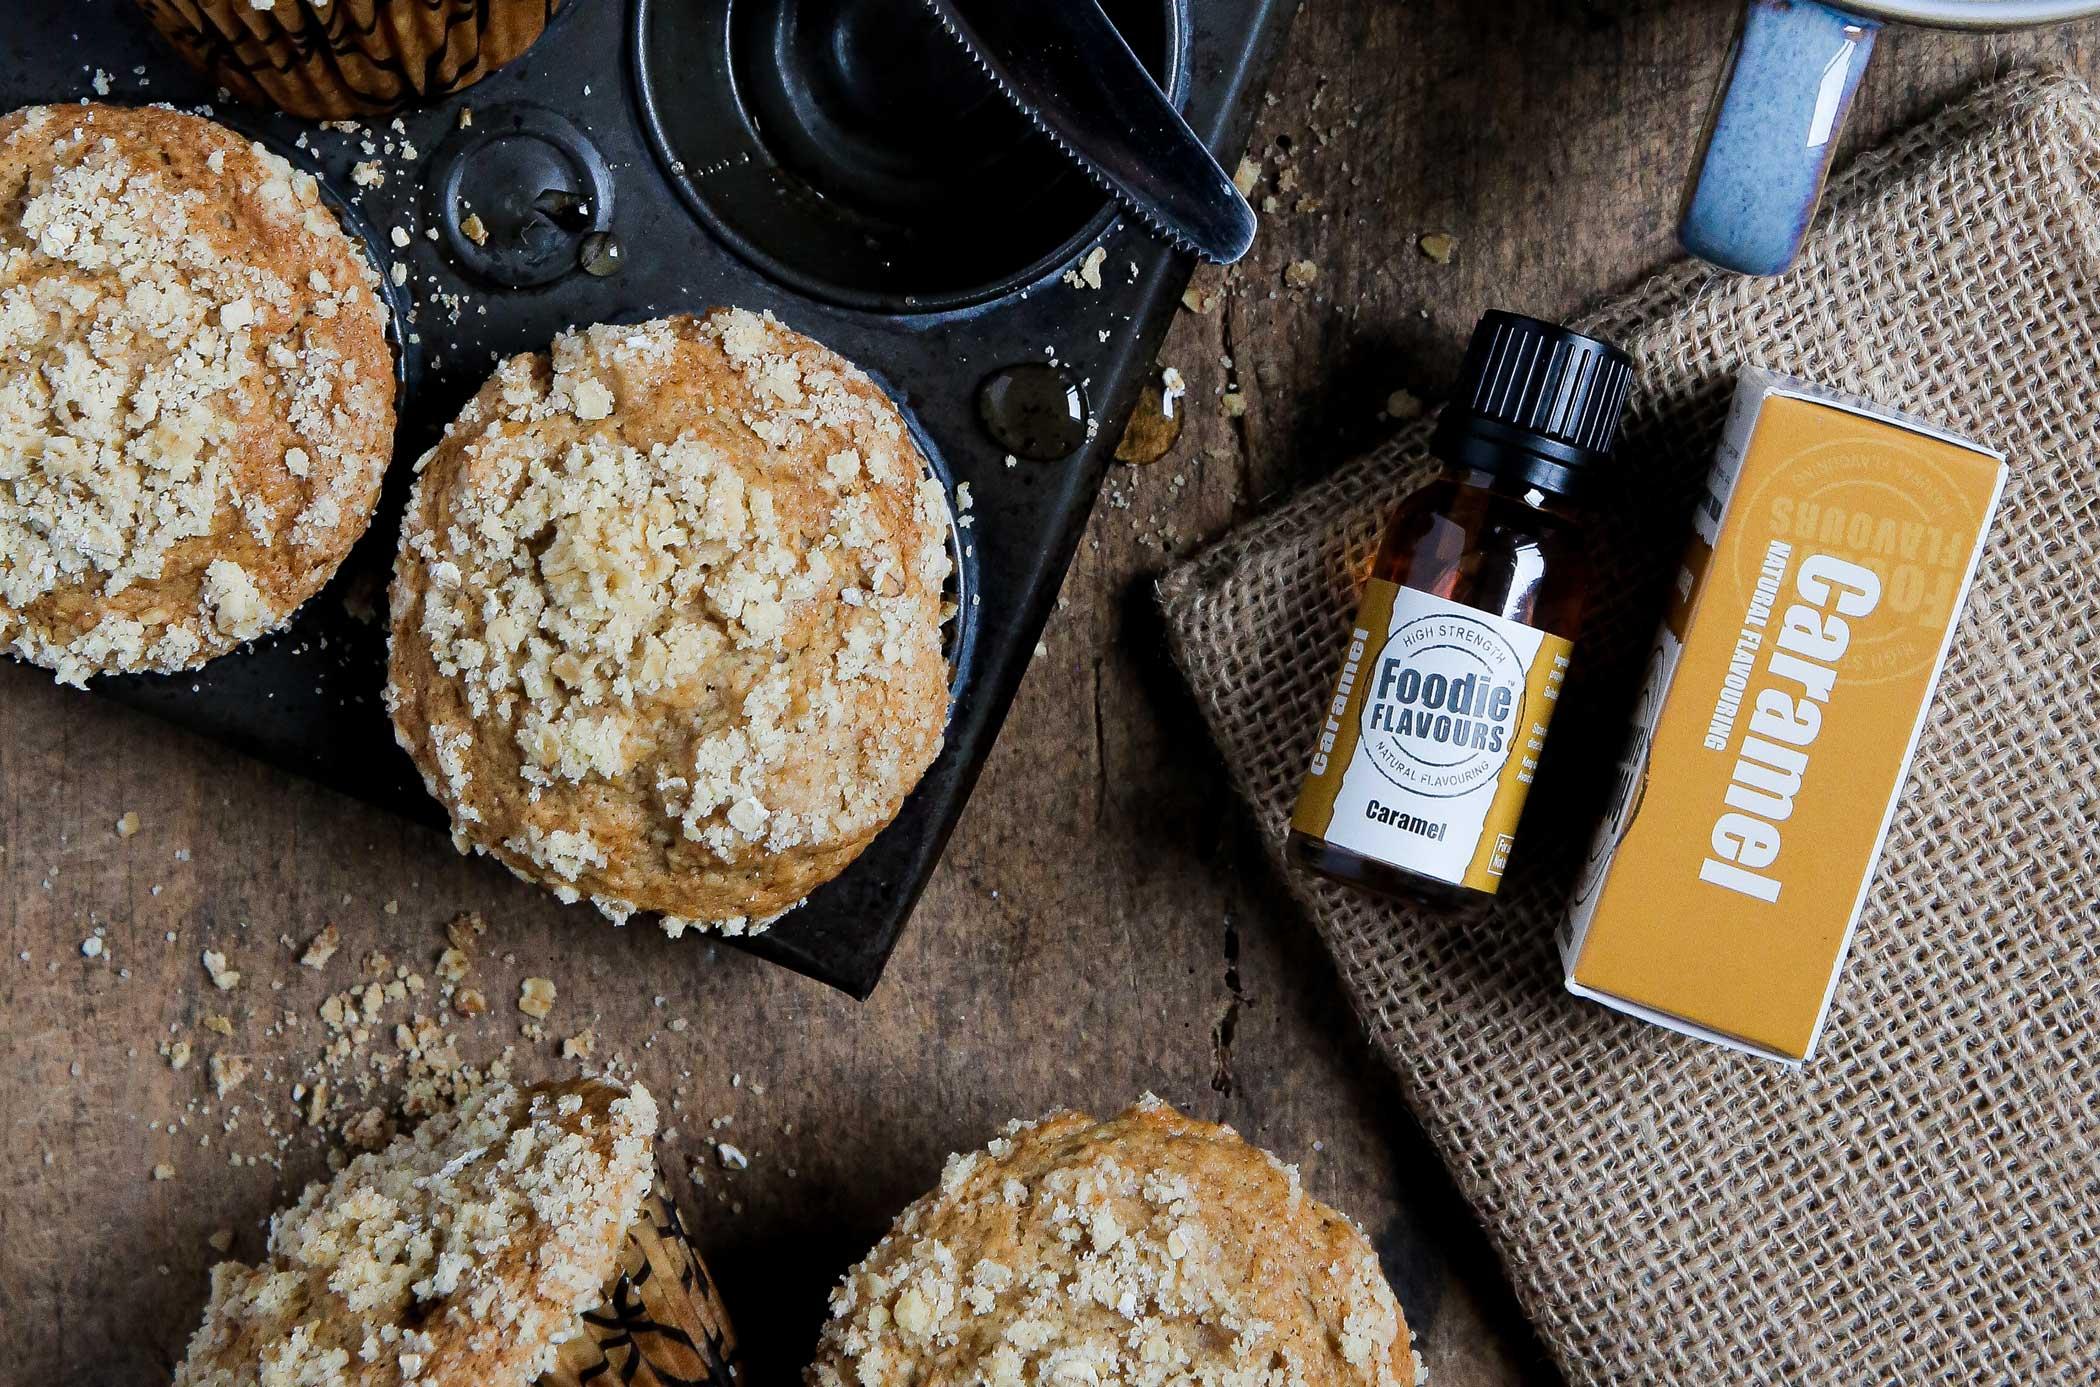 Caramel & Apple Muffins